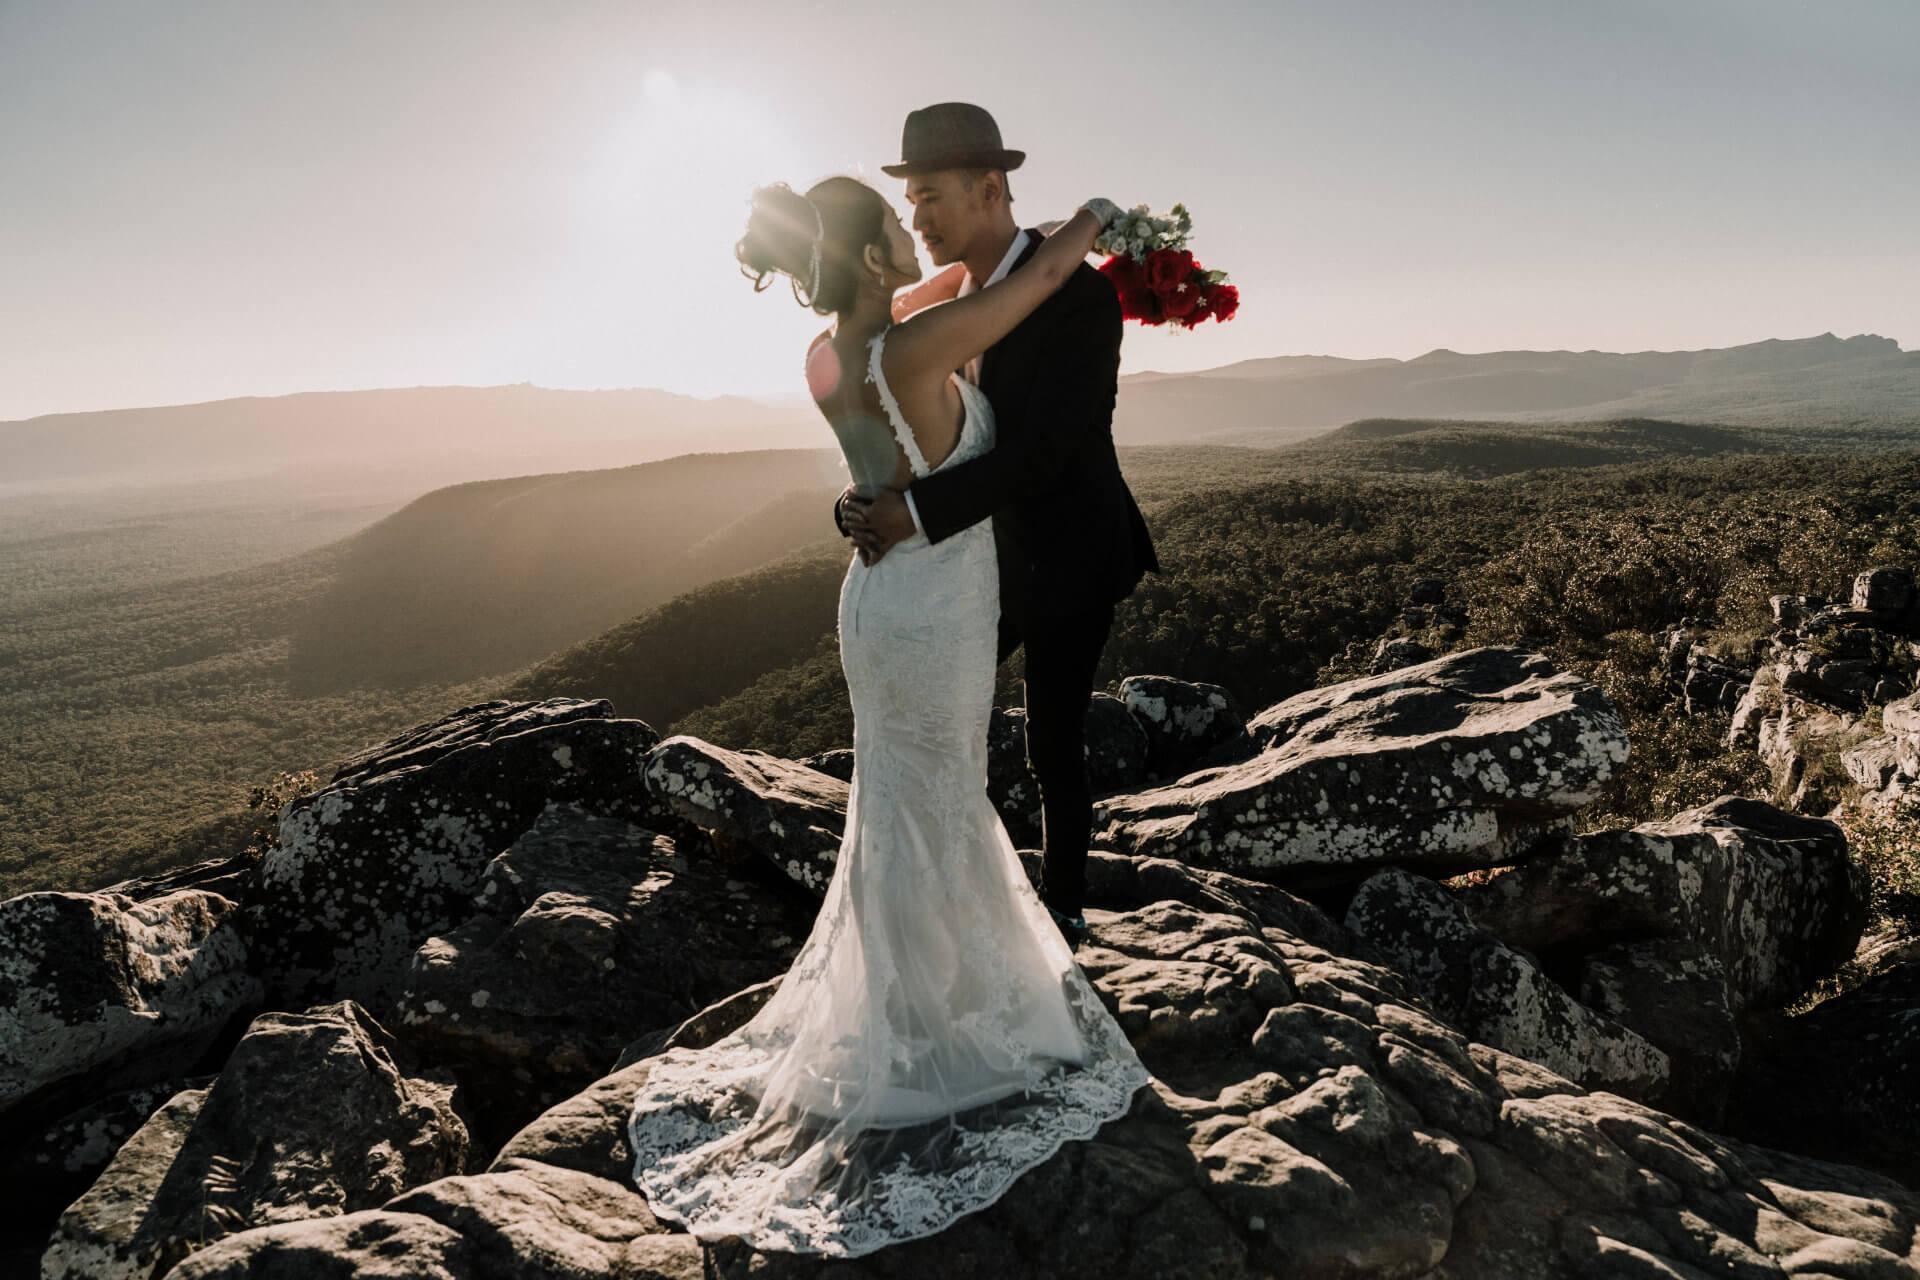 Elopment wedding photos idea on the mountain of Australia